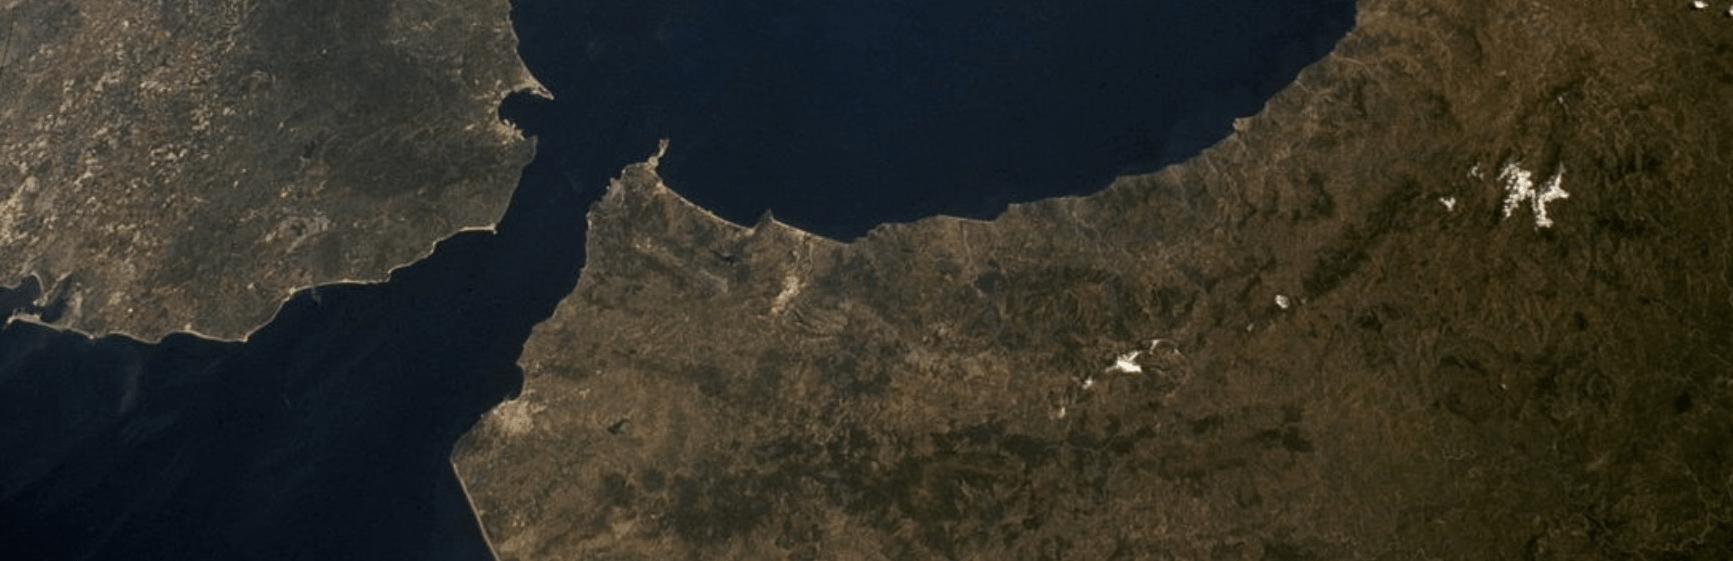 Ubicación de Viviendas Turísticas en Atlanterra